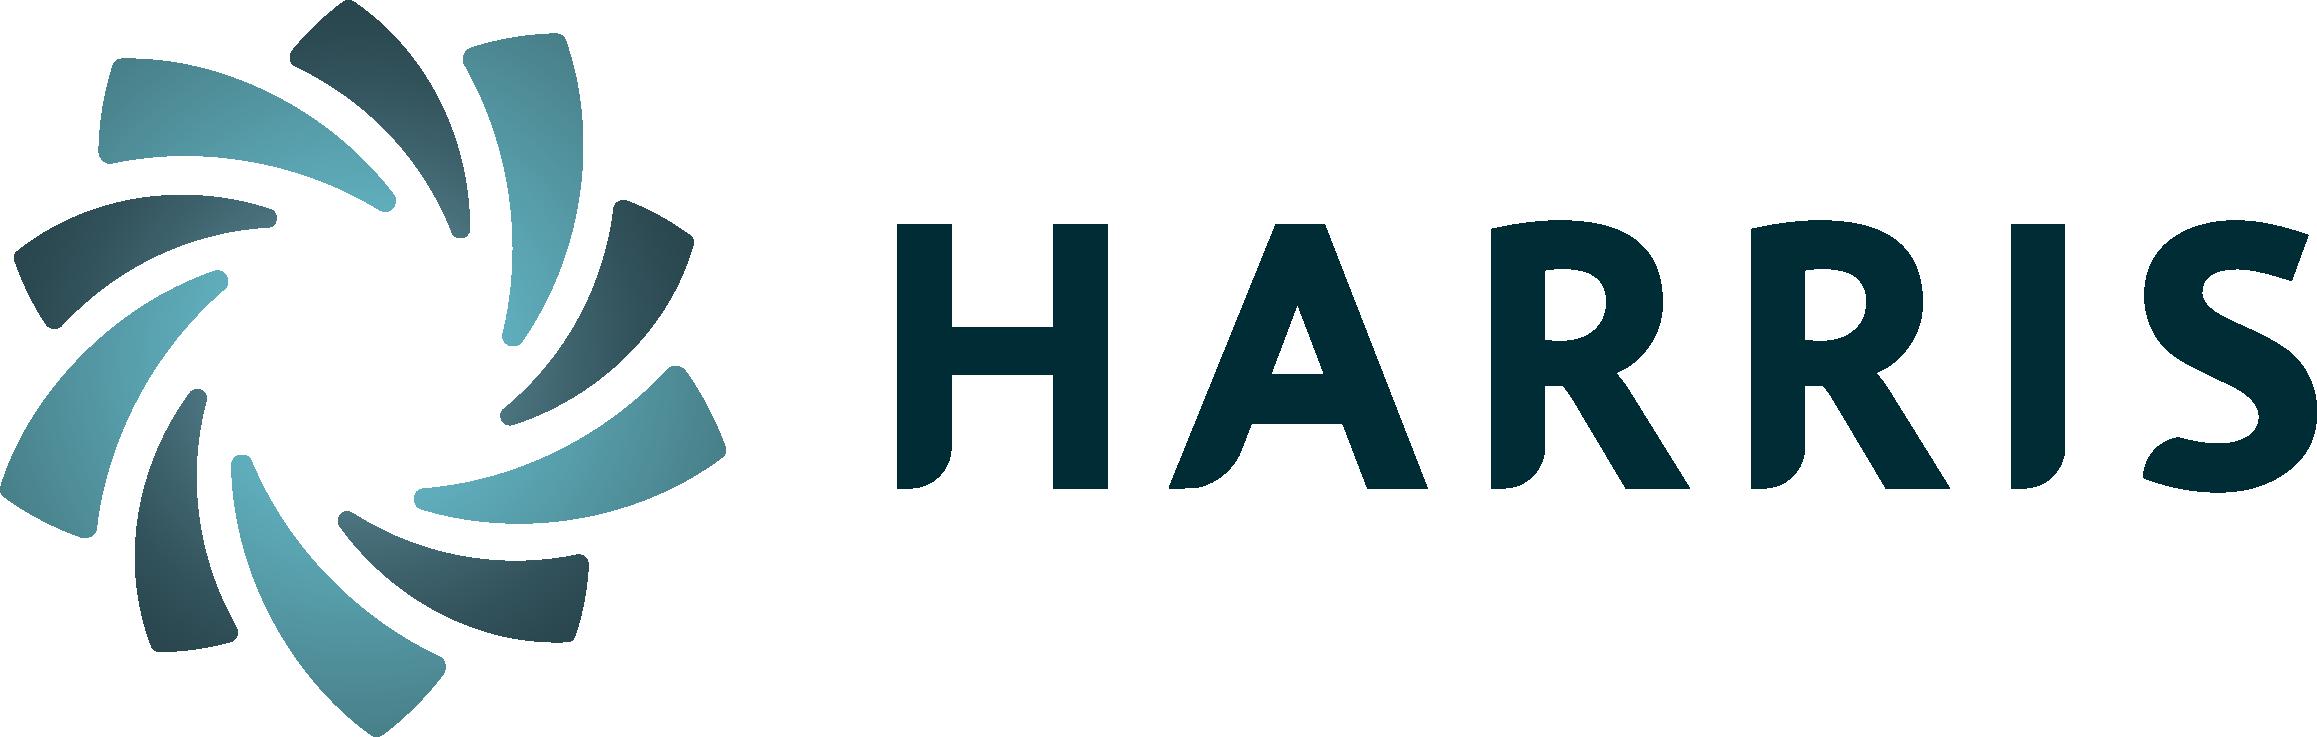 Harris-Computer-logo.png